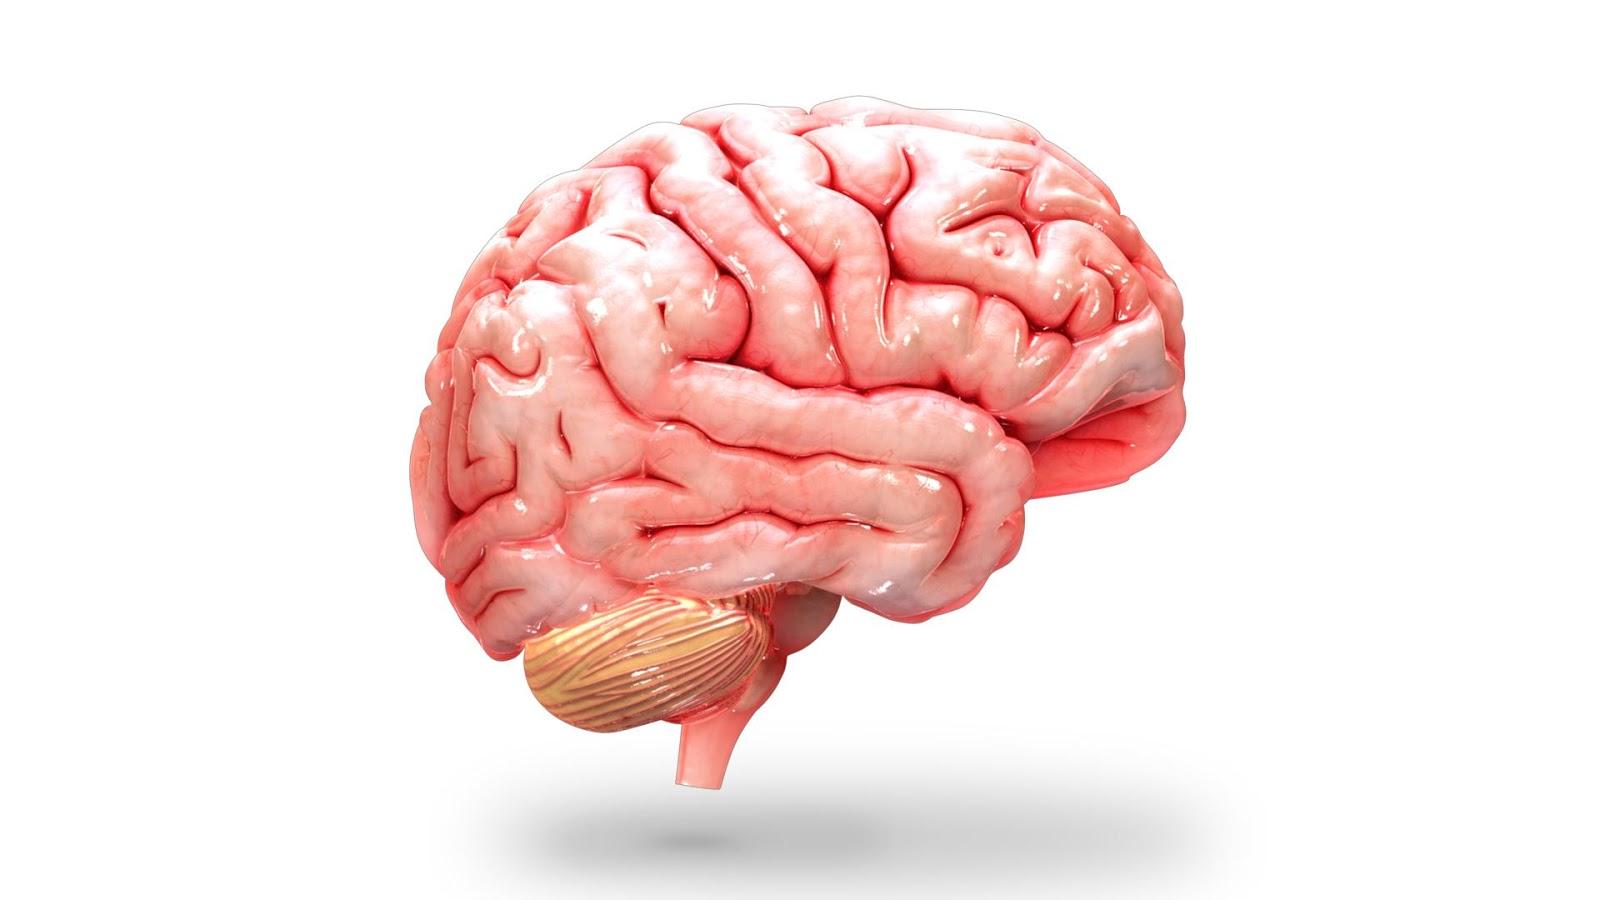 . PlusPng.com VR Human Brain 1.0.6 screenshot 4 PlusPng.com  - Brain HD PNG